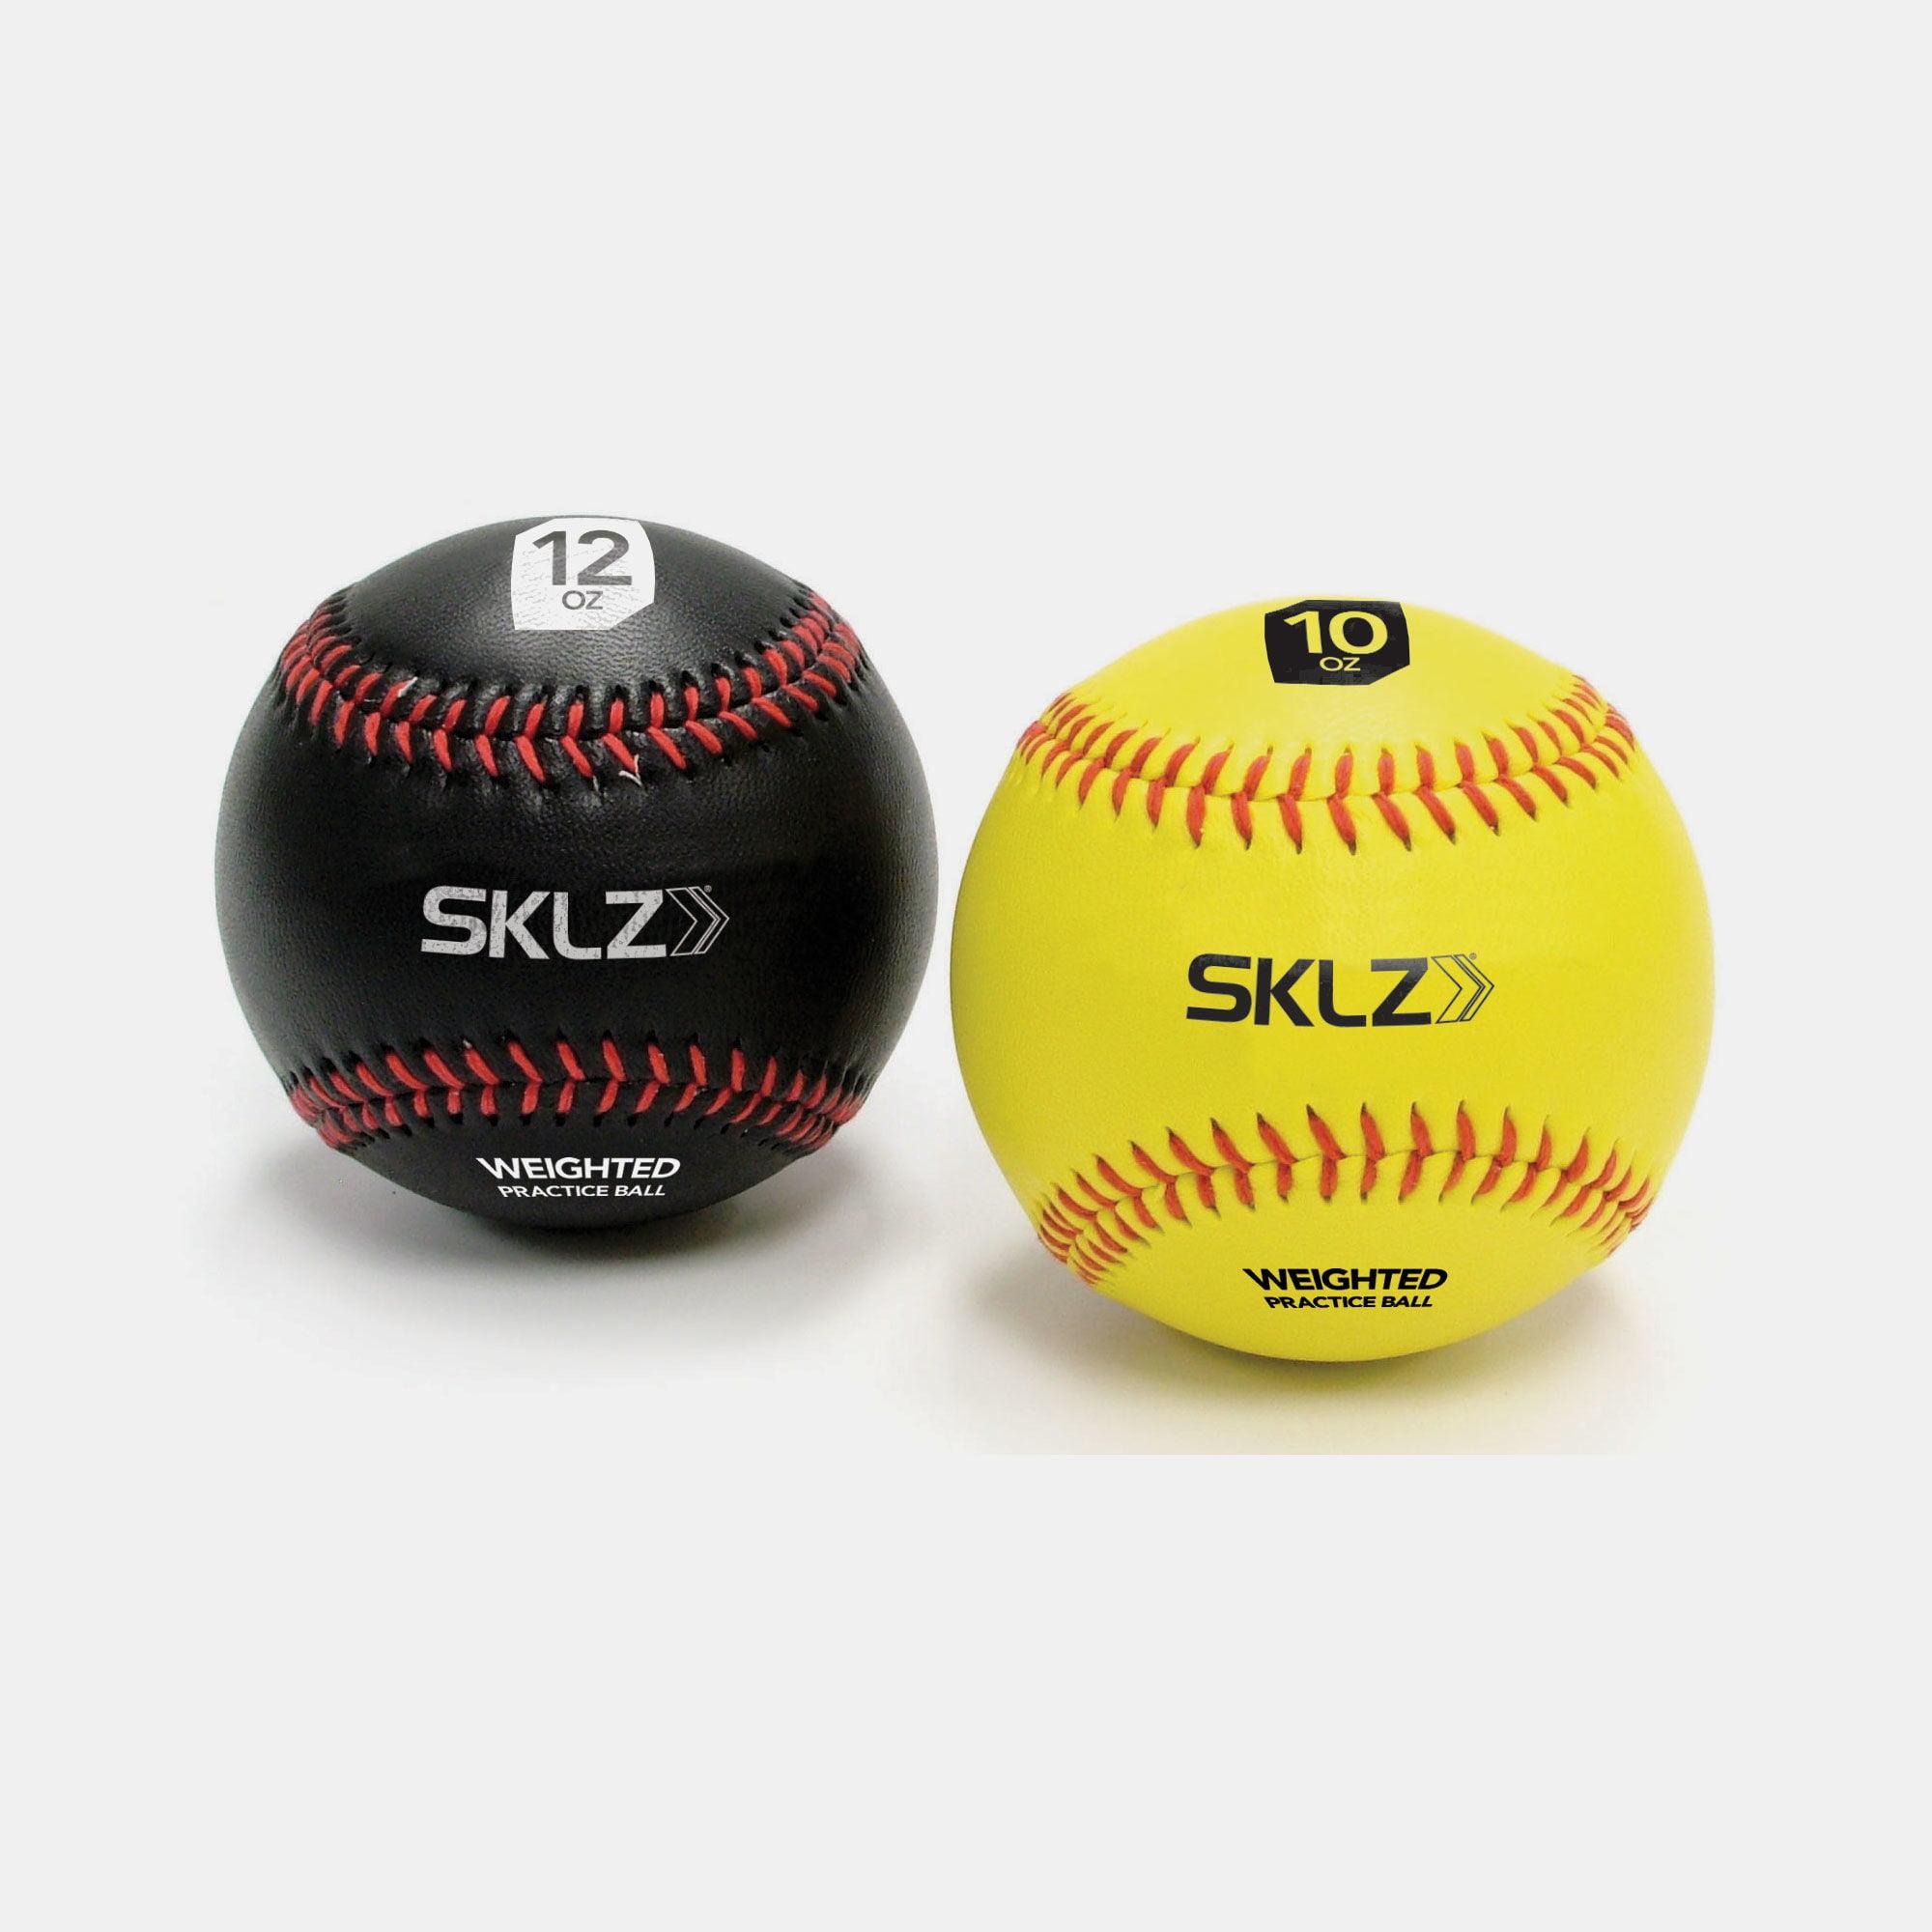 SKLZ Weighted Training Baseballs, 2 pk